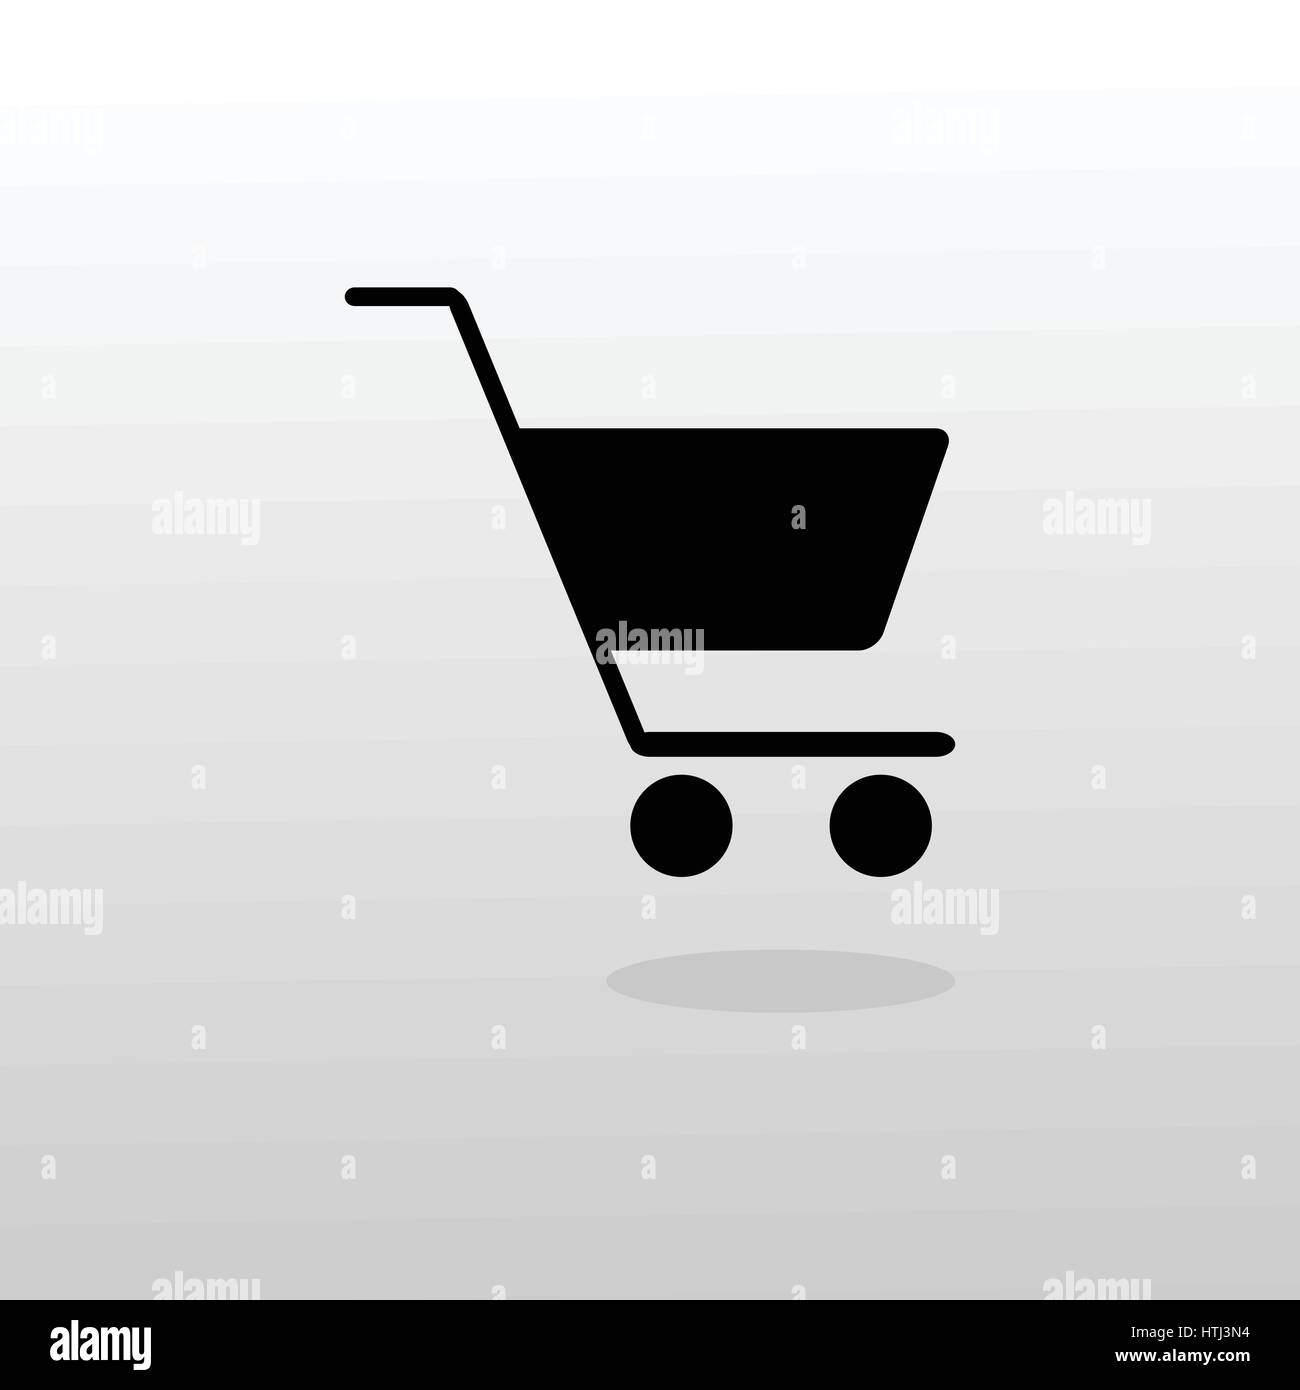 Shopping cart illustration - Stock Vector